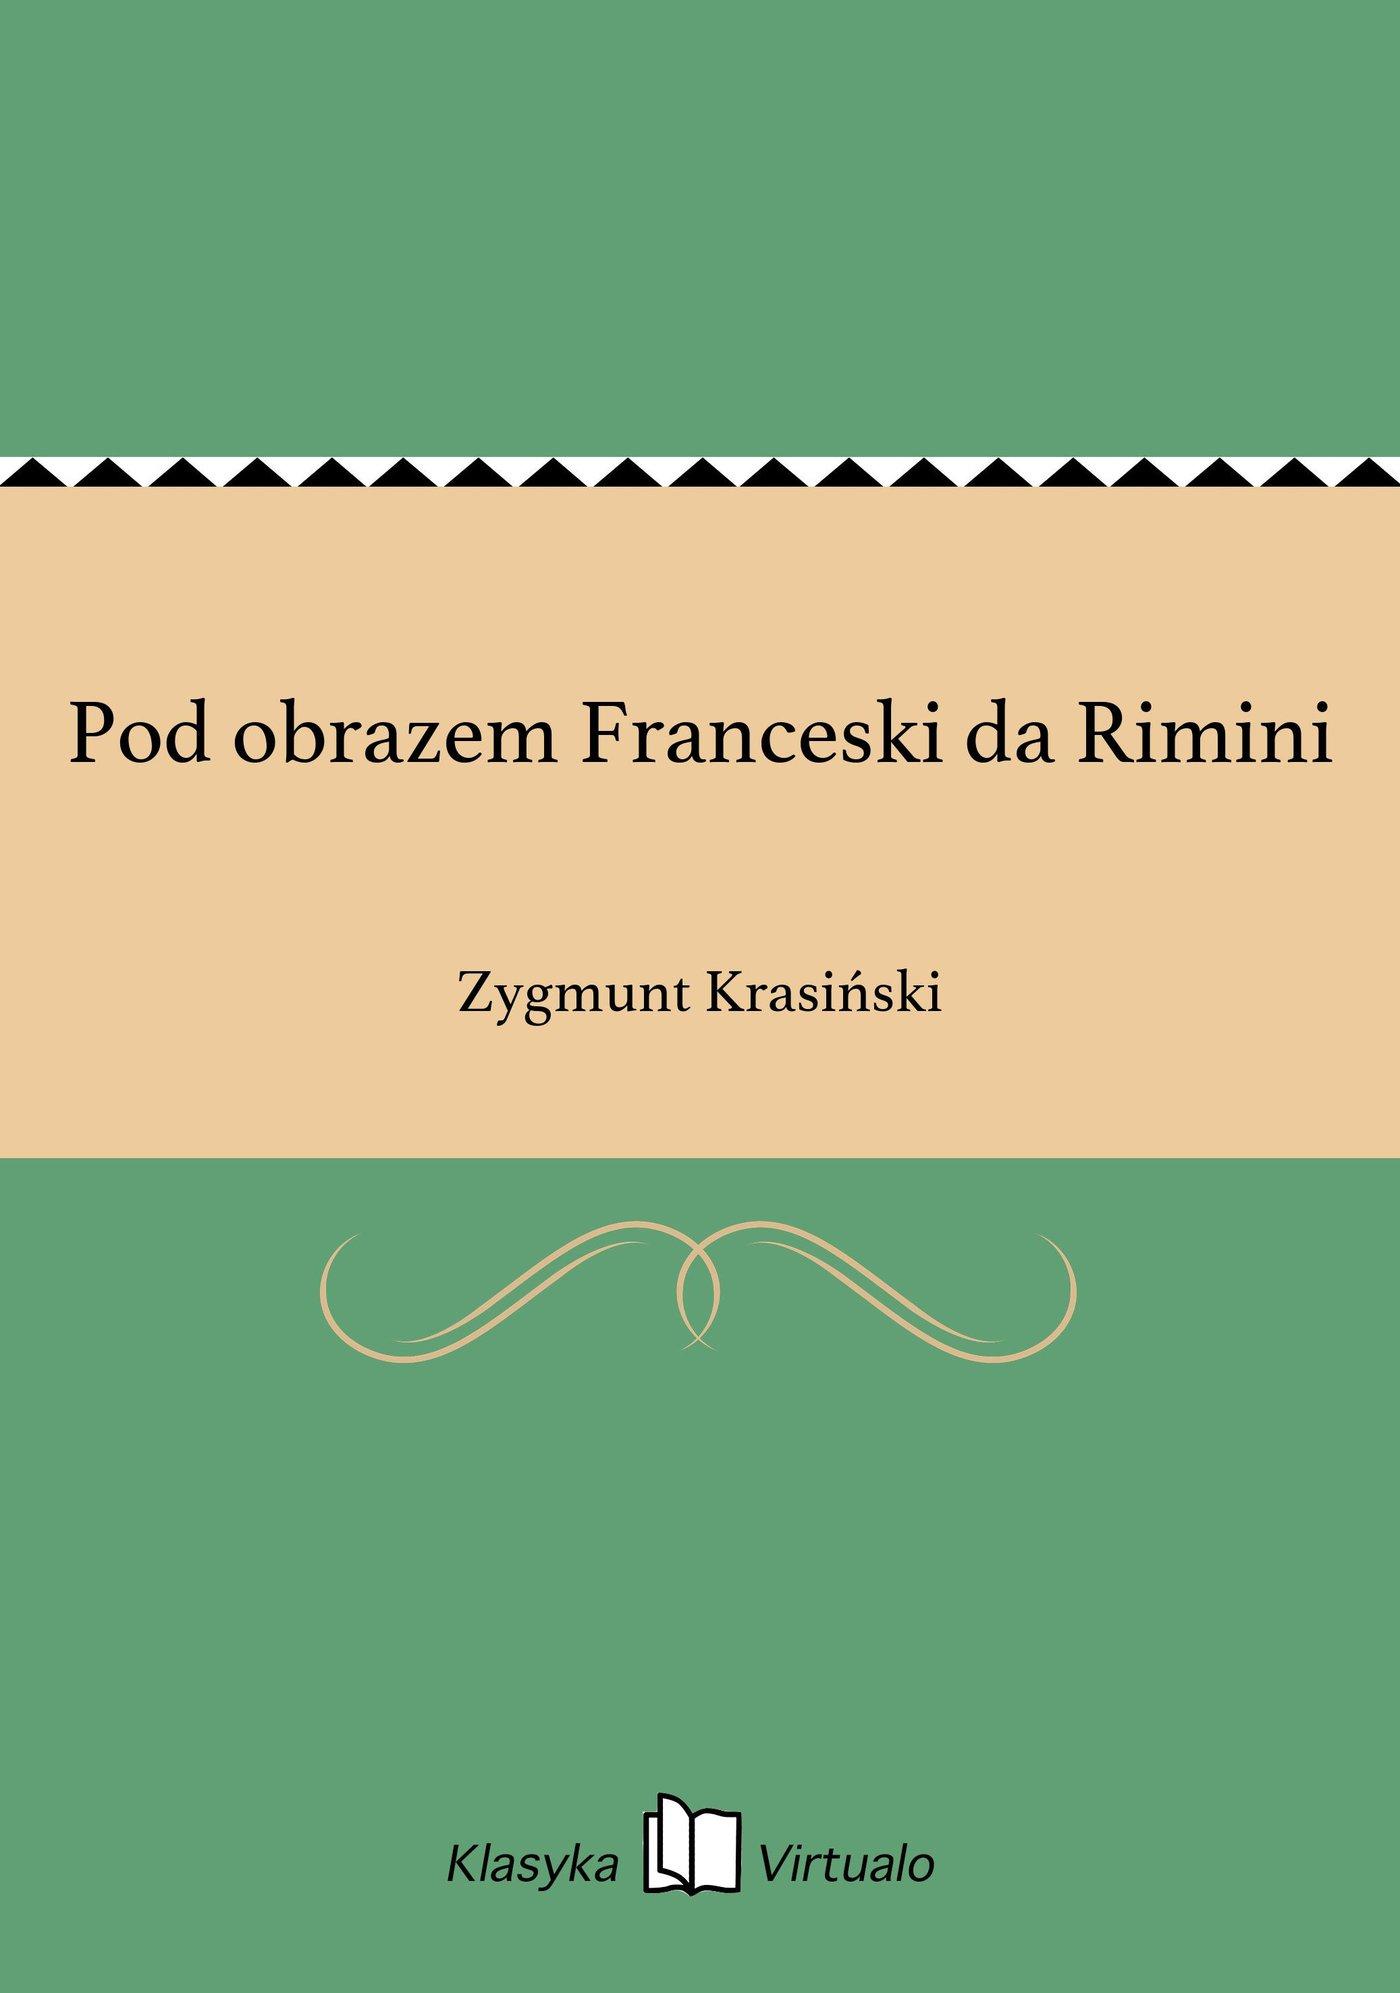 Pod obrazem Franceski da Rimini - Ebook (Książka EPUB) do pobrania w formacie EPUB